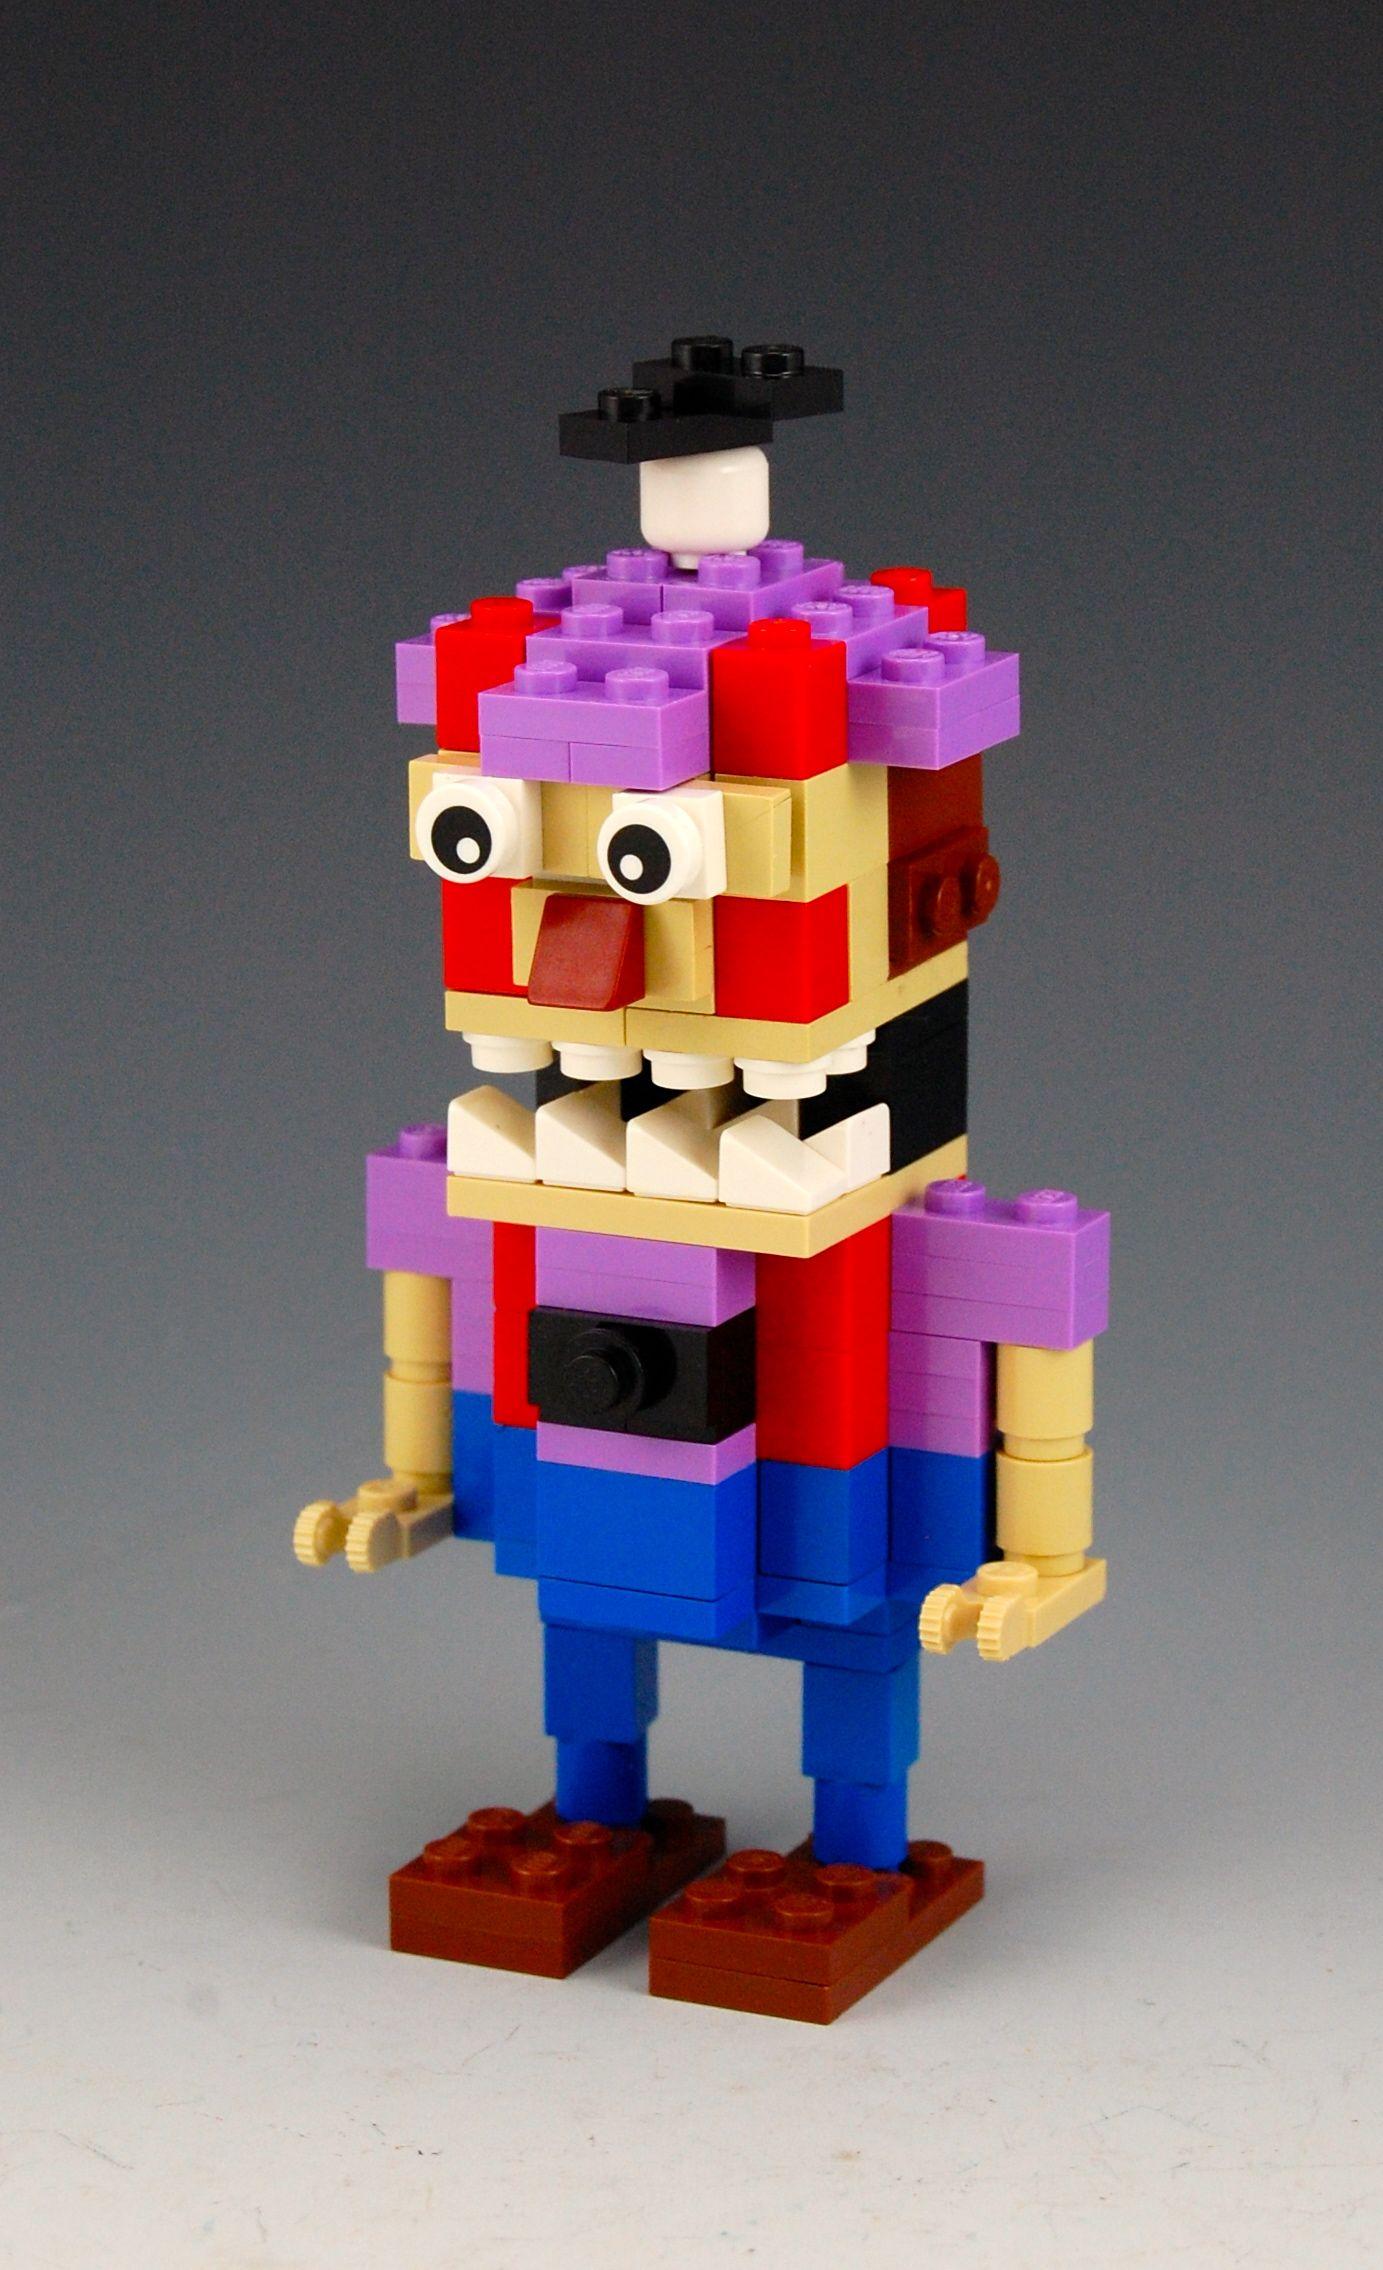 Lego Five Nights At Freddy S Balloon Boy By Brickbum Five Nights At Freddy S Lego Fun Crafts